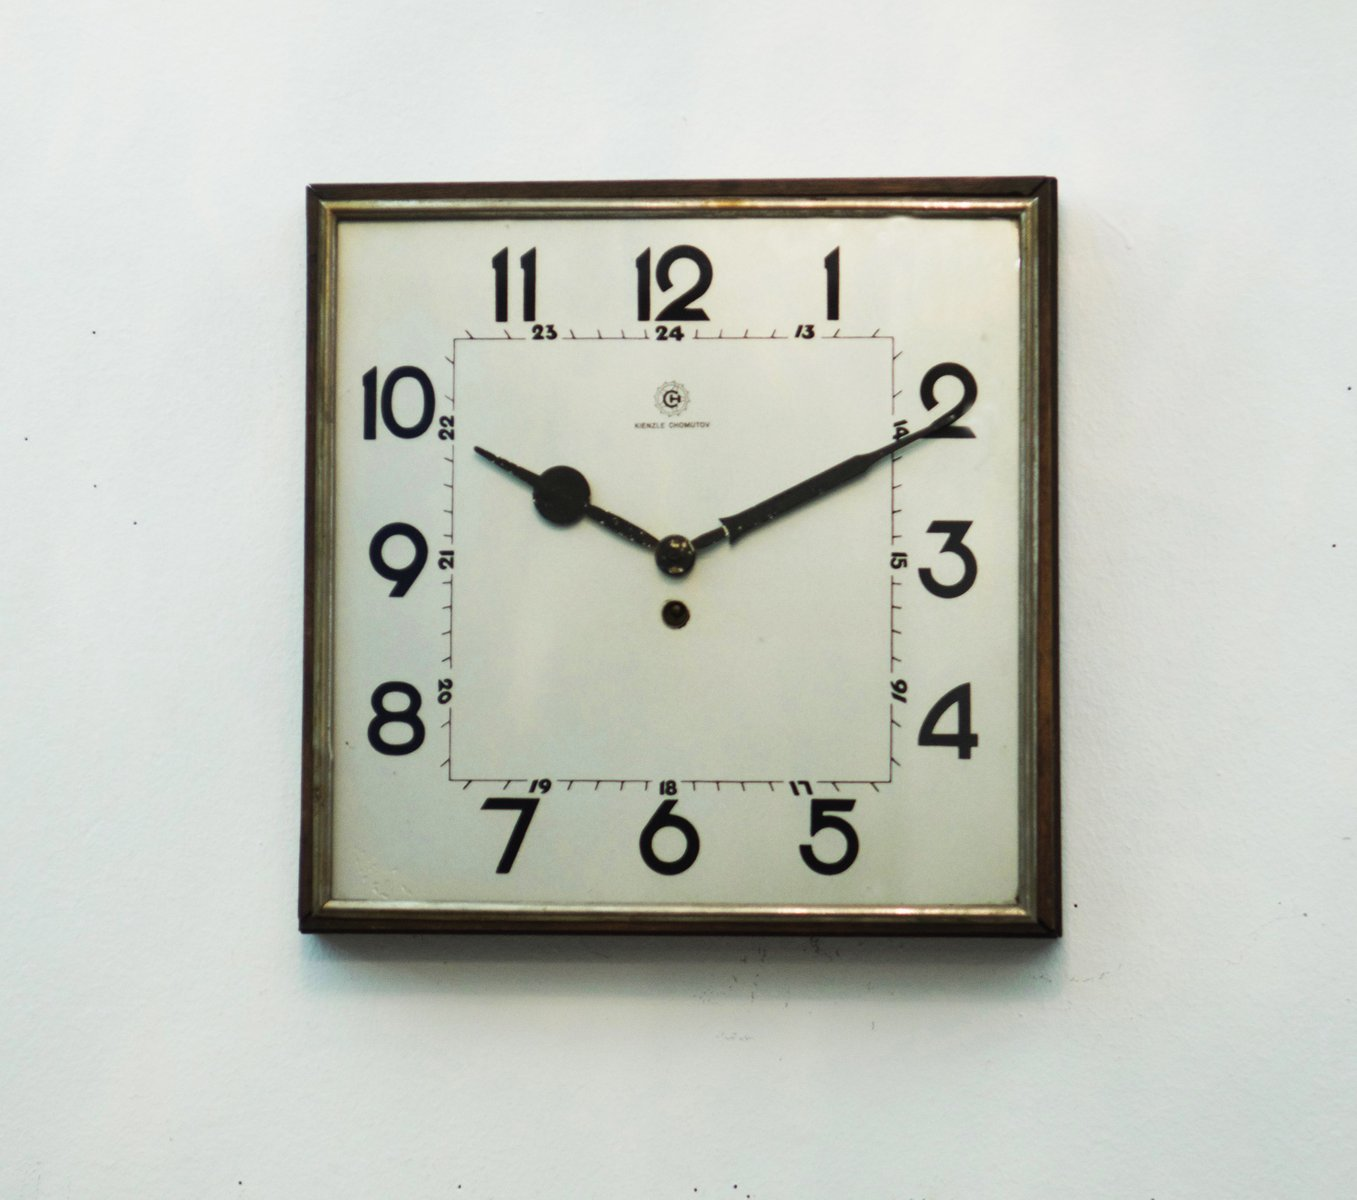 grosse horloge murale bauhaus de kienzle 1930s en vente. Black Bedroom Furniture Sets. Home Design Ideas